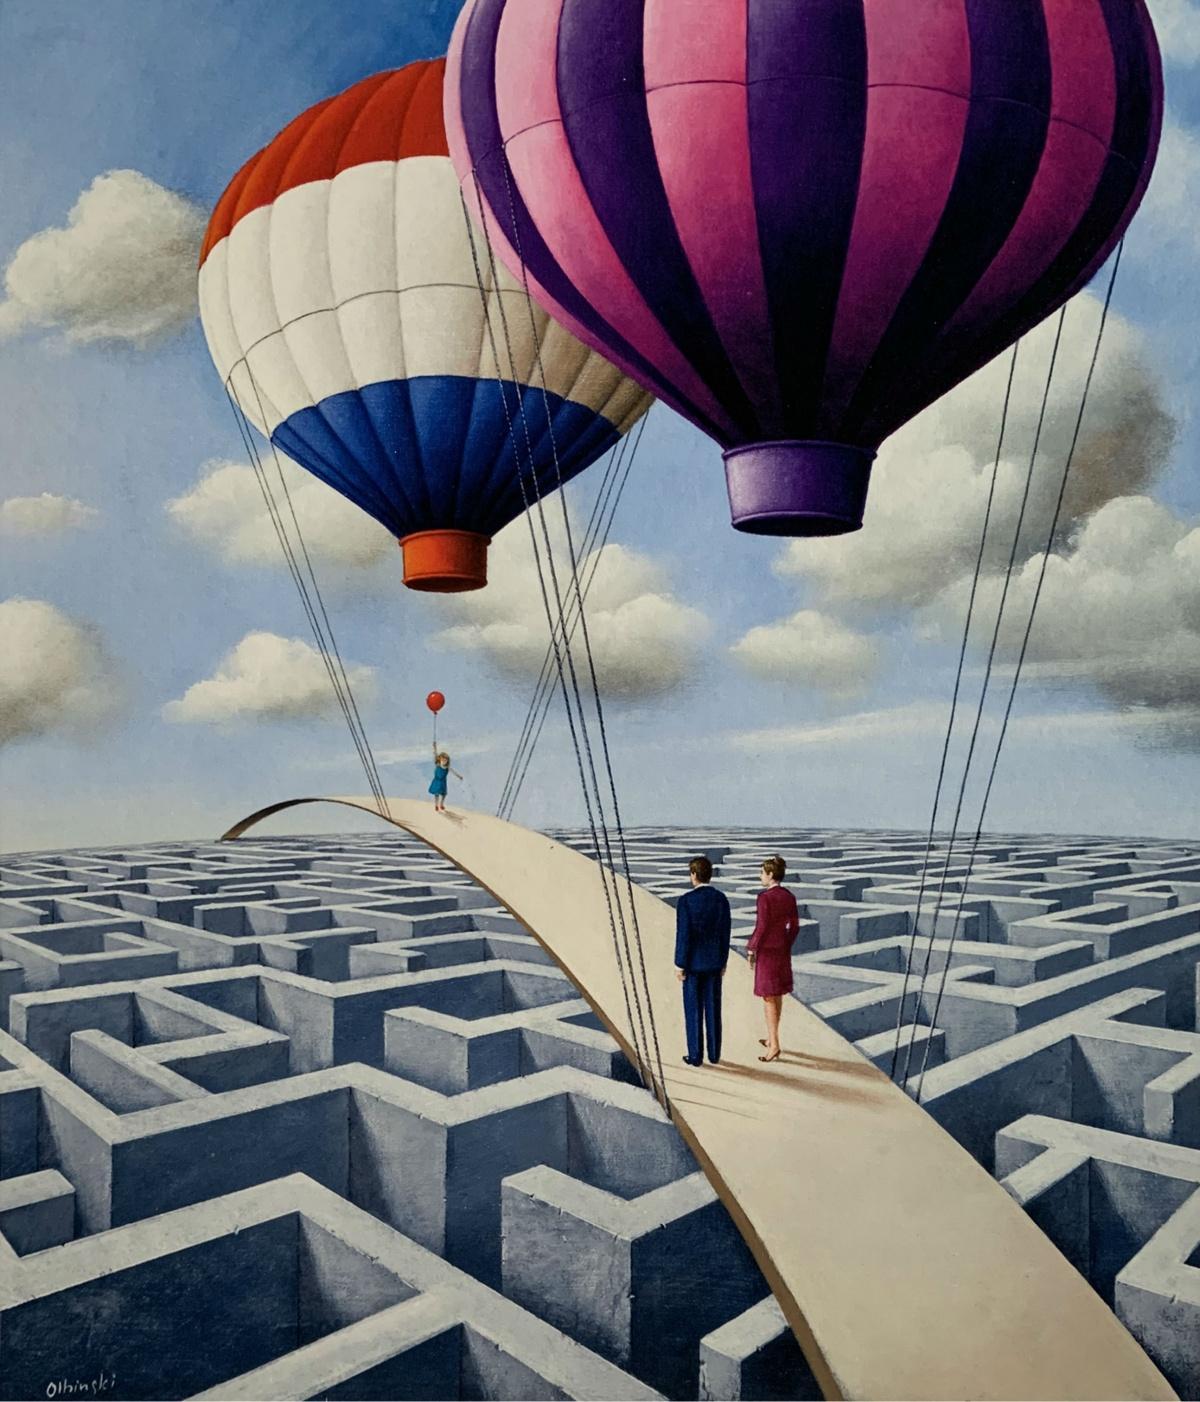 Hot-air balloons - 21st century, Figurative Surrealist print, Vibrant colors